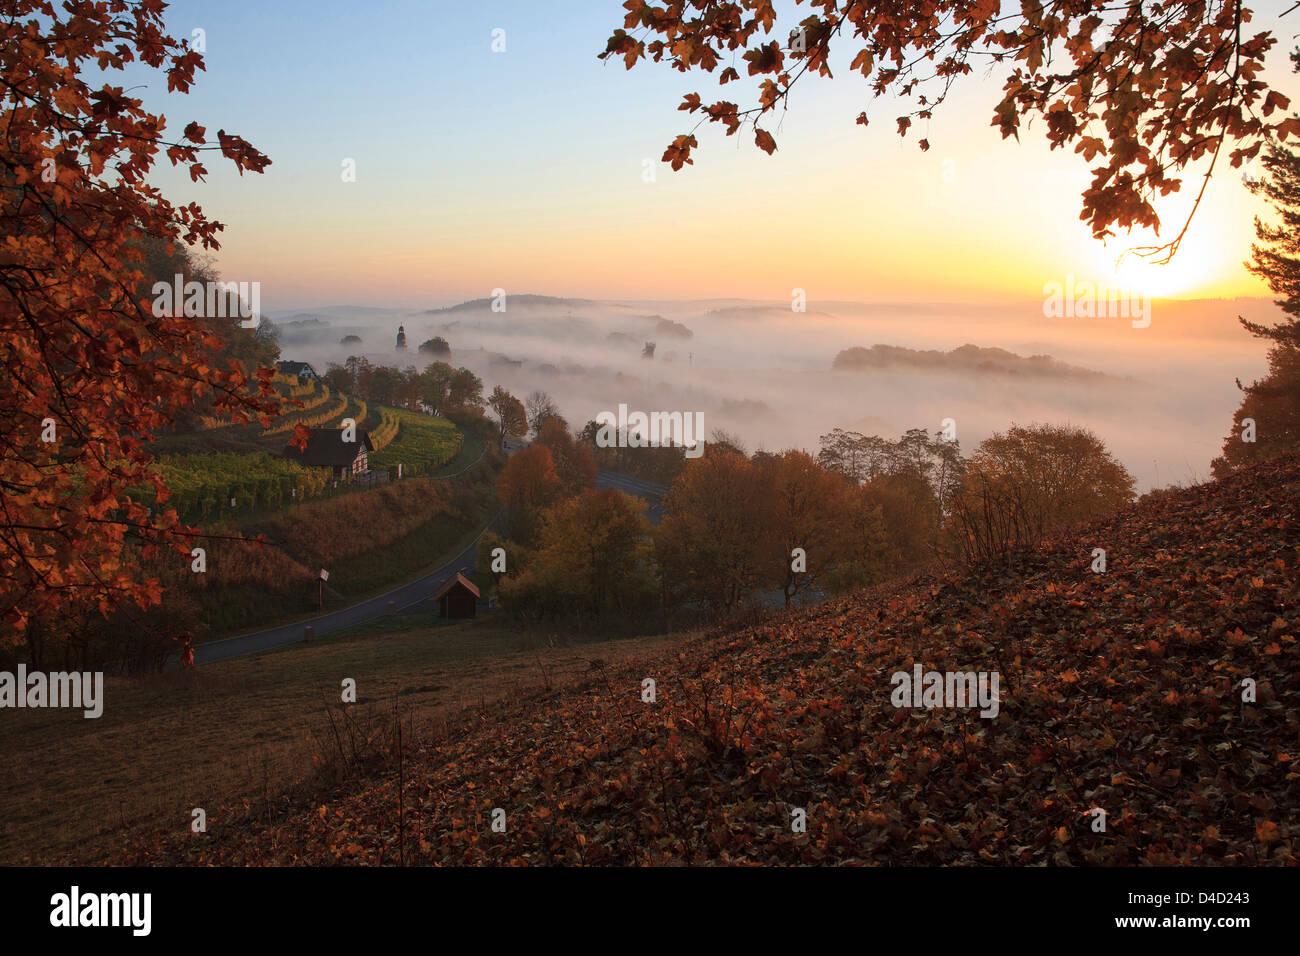 Saaletal, Thuringia, Germany, Europe - Stock Image